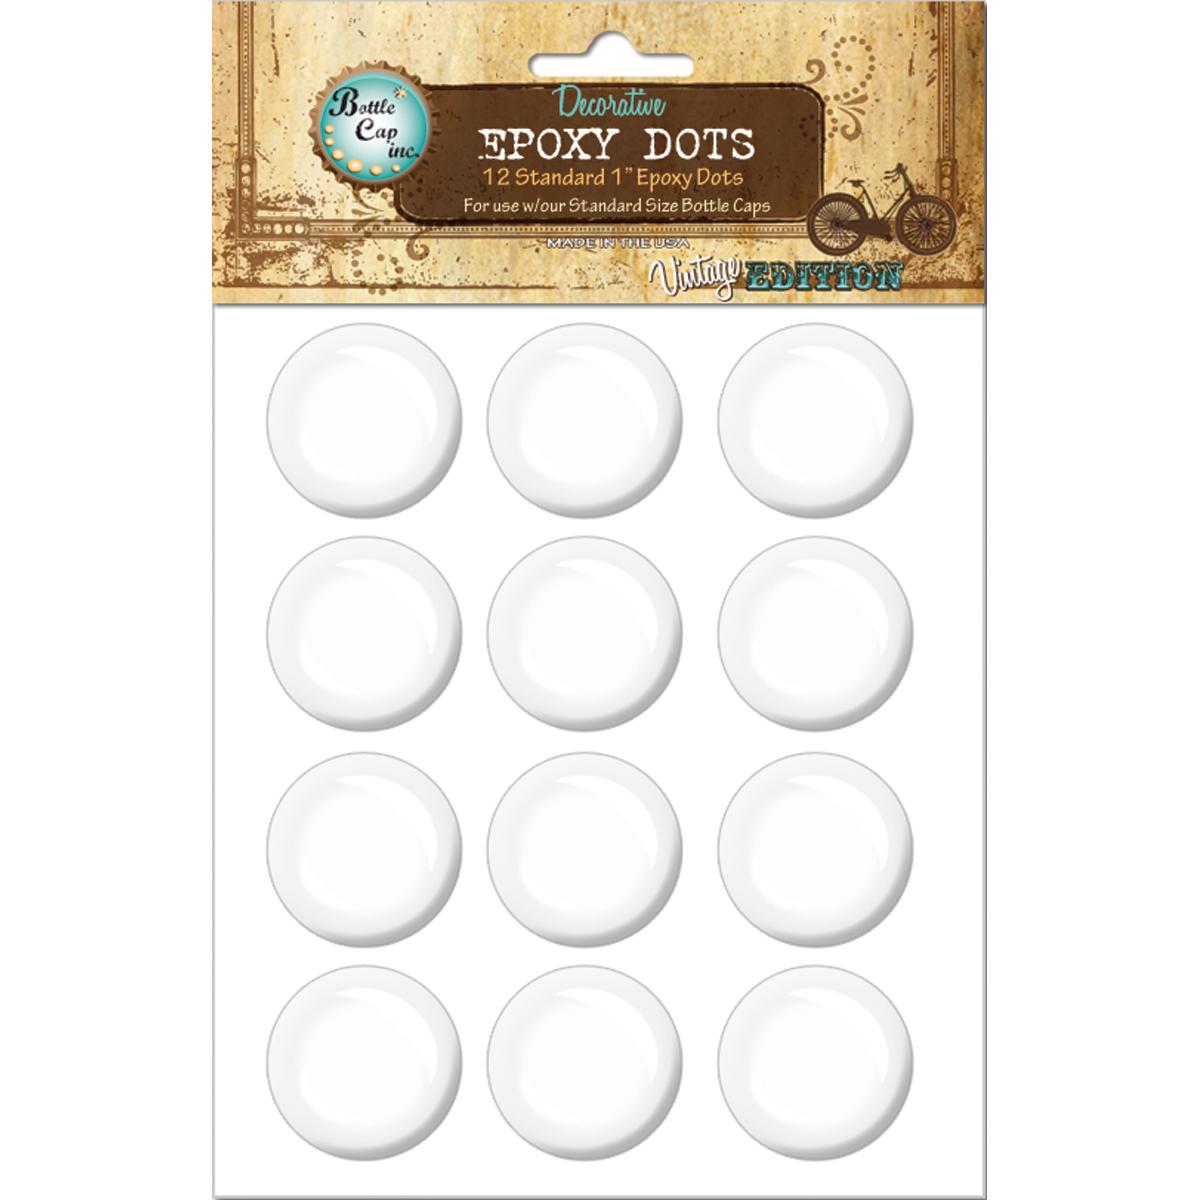 Vintage Epoxy Dot Clear Stickers 1 12/Pkg-Round